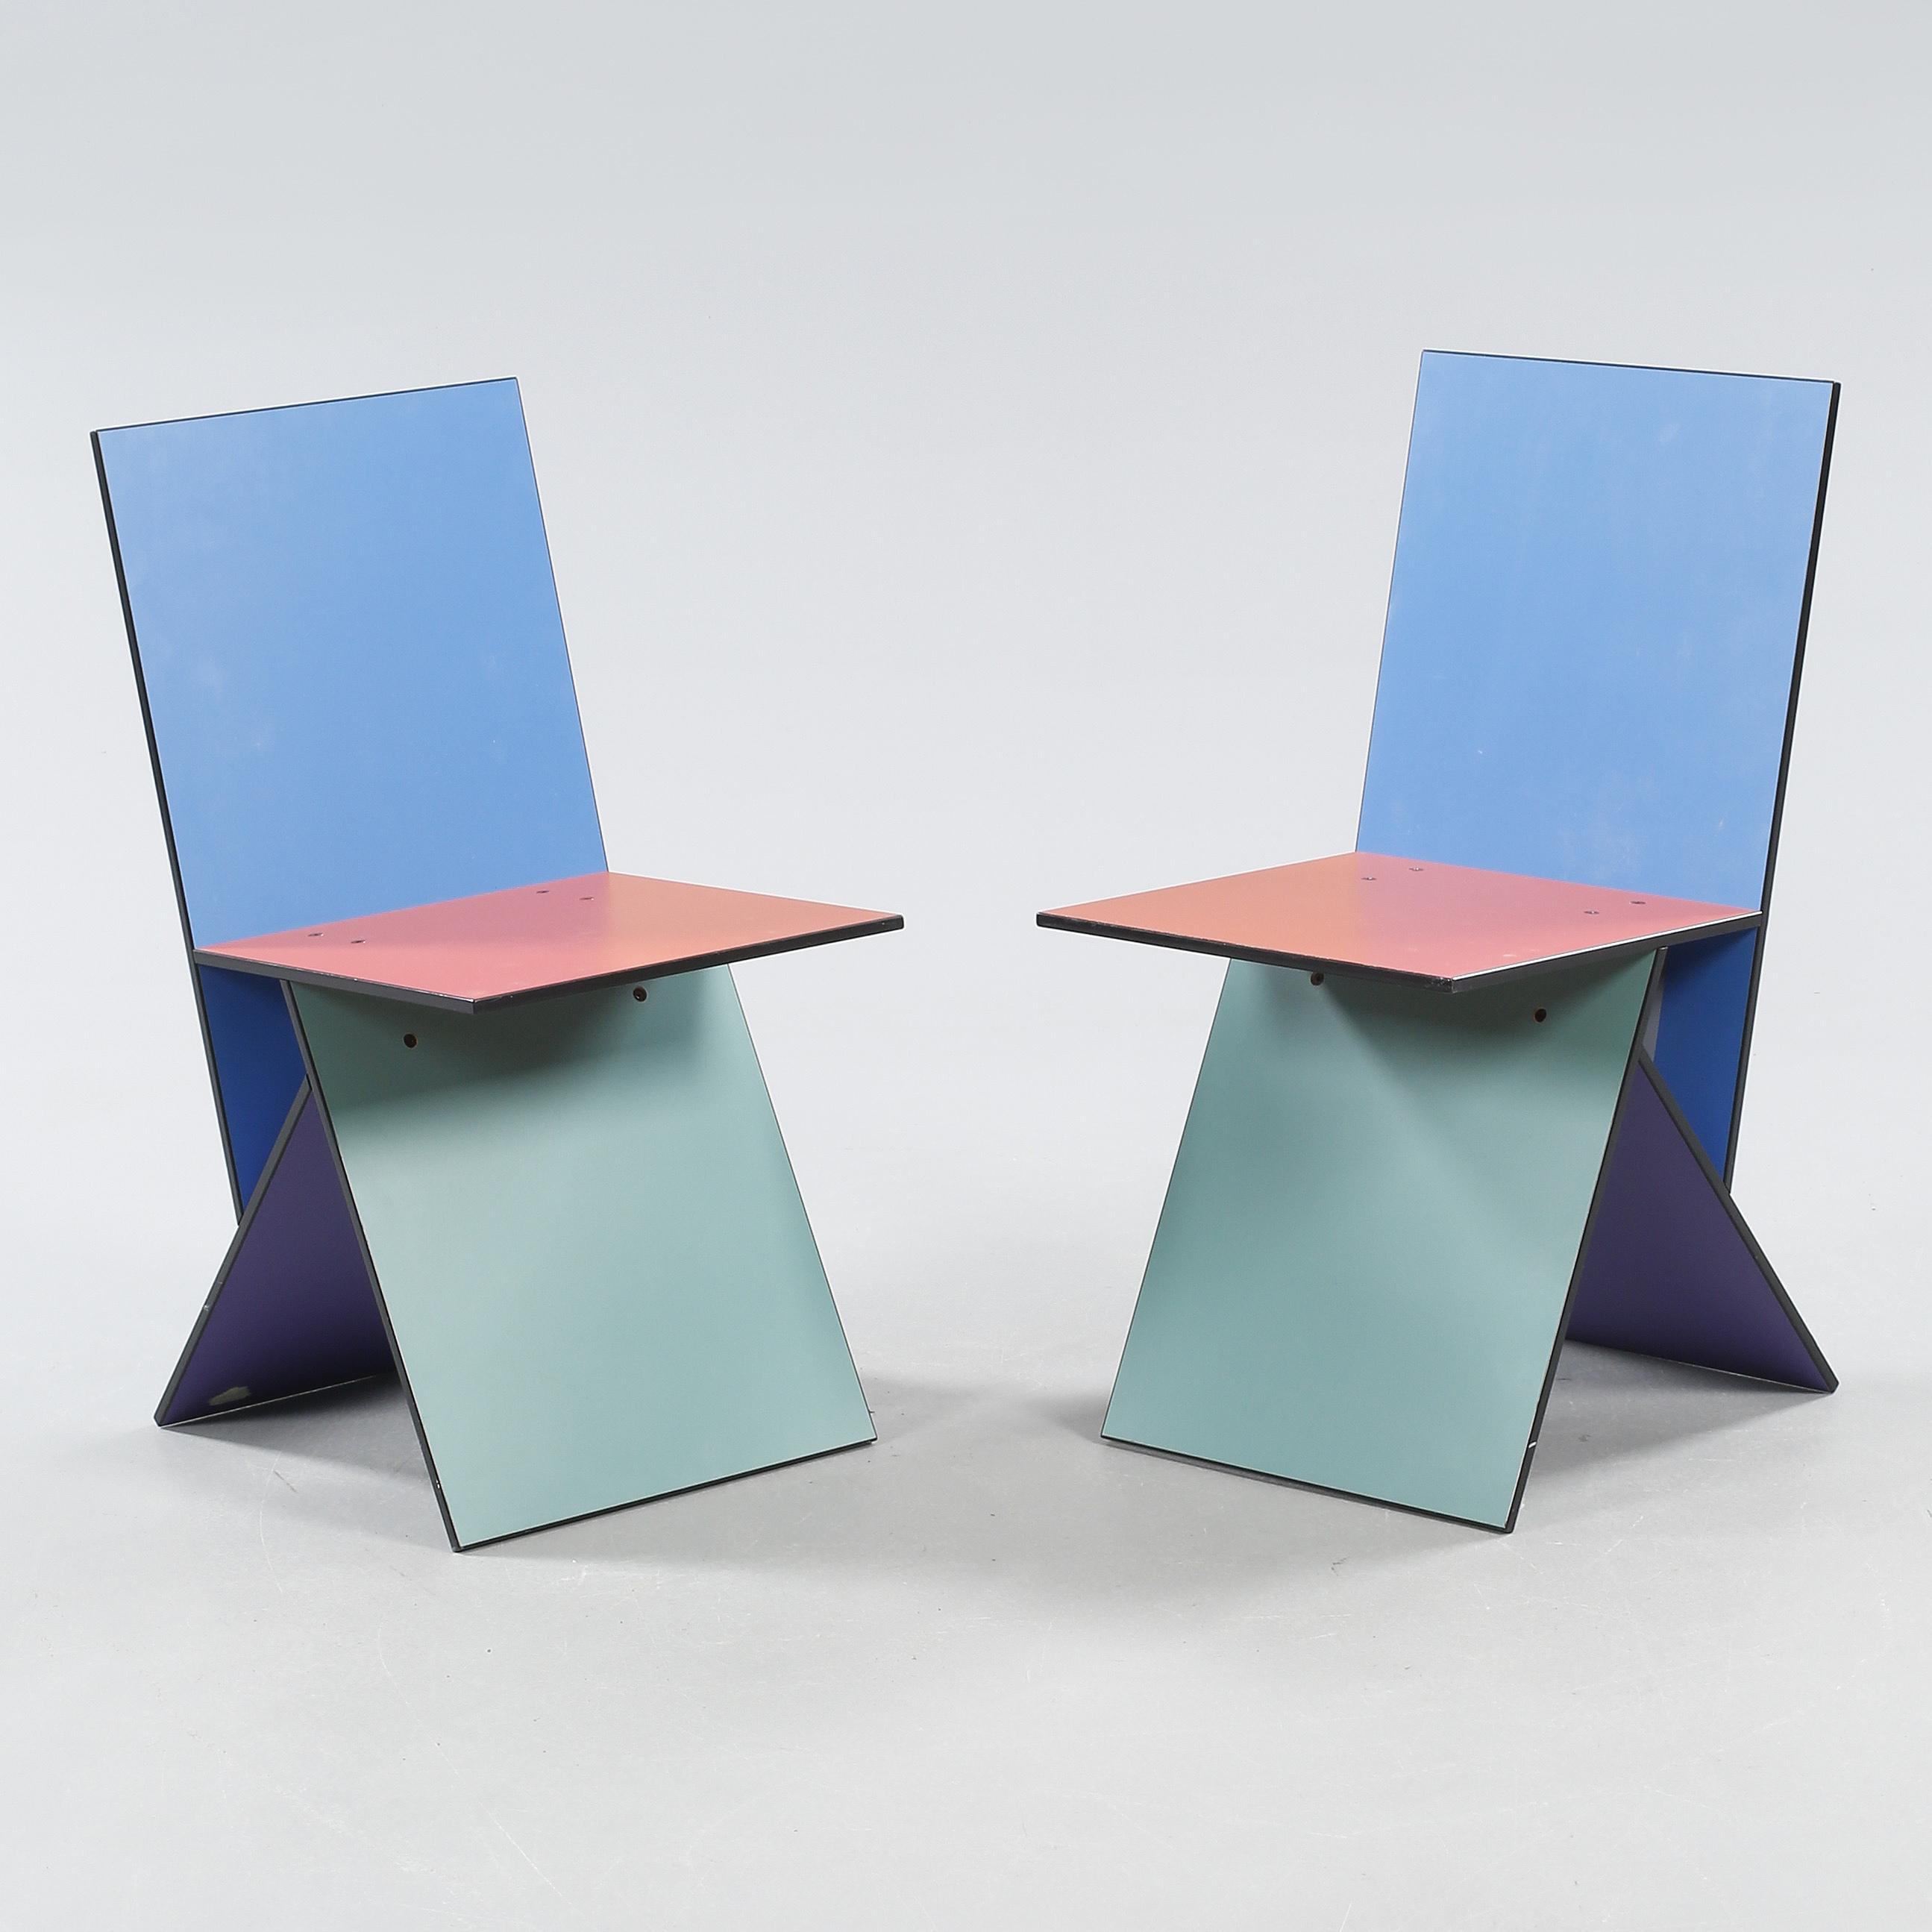 verner panton ett par stolar vilbert ikea 1993 94 bukowskis. Black Bedroom Furniture Sets. Home Design Ideas